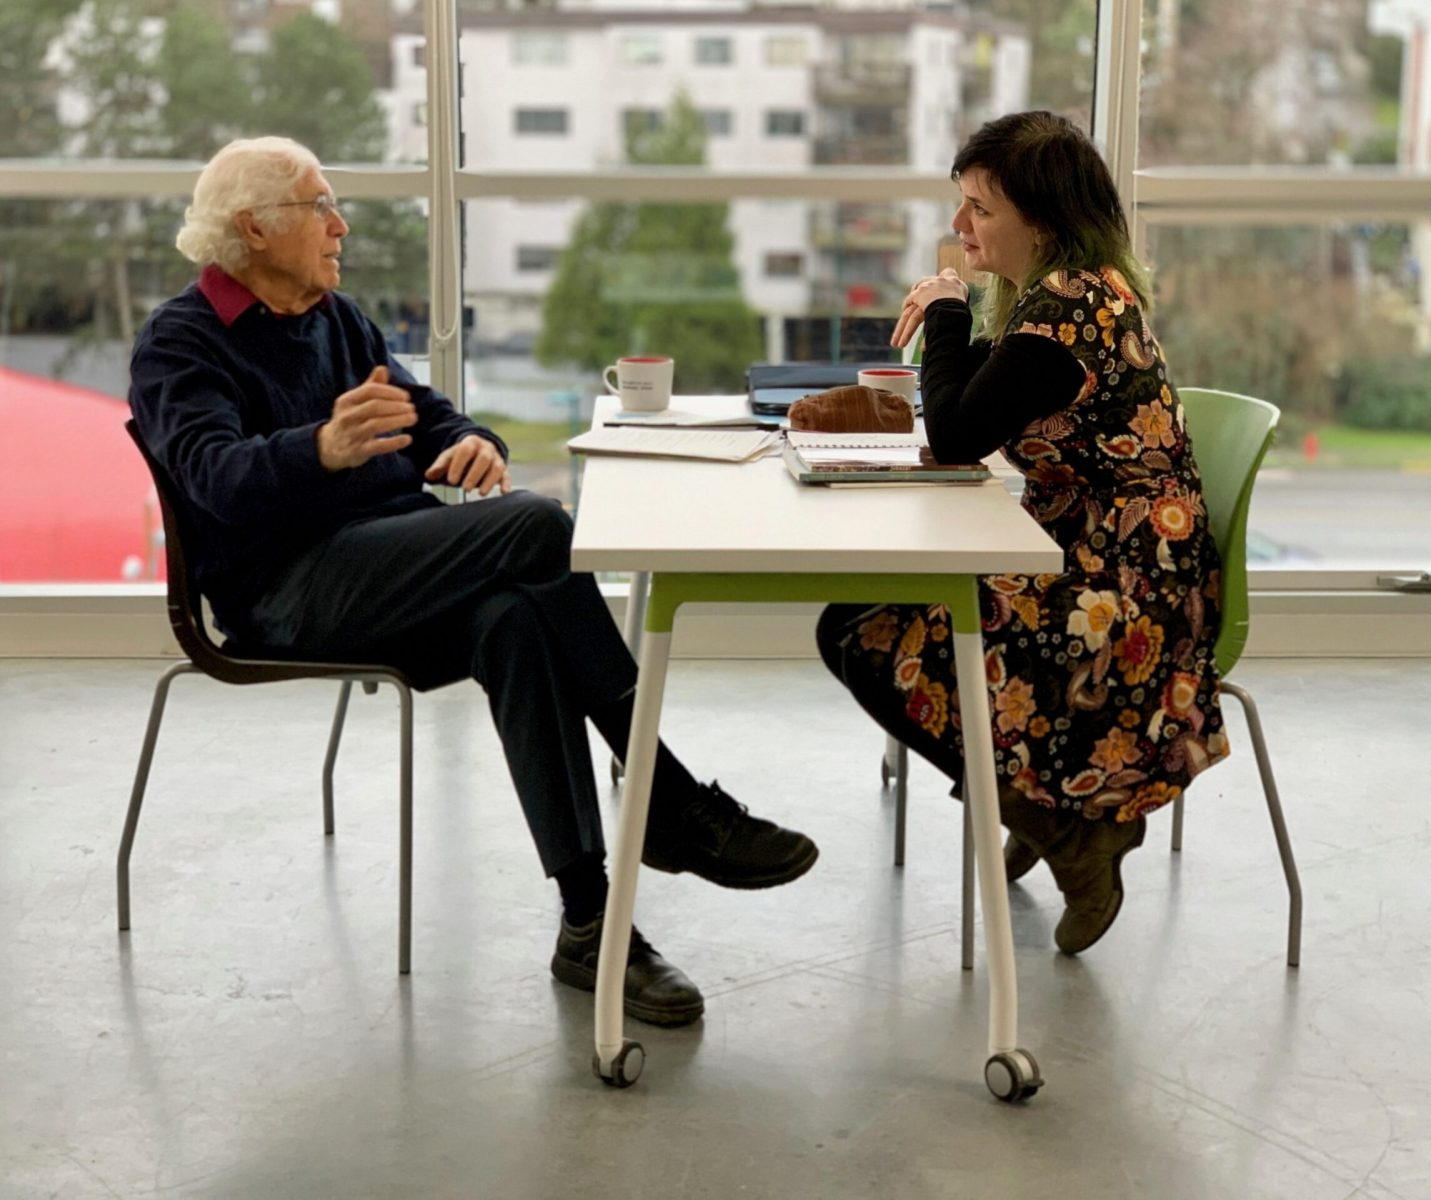 David and Miriam speaking (Vancouver, January 2020)